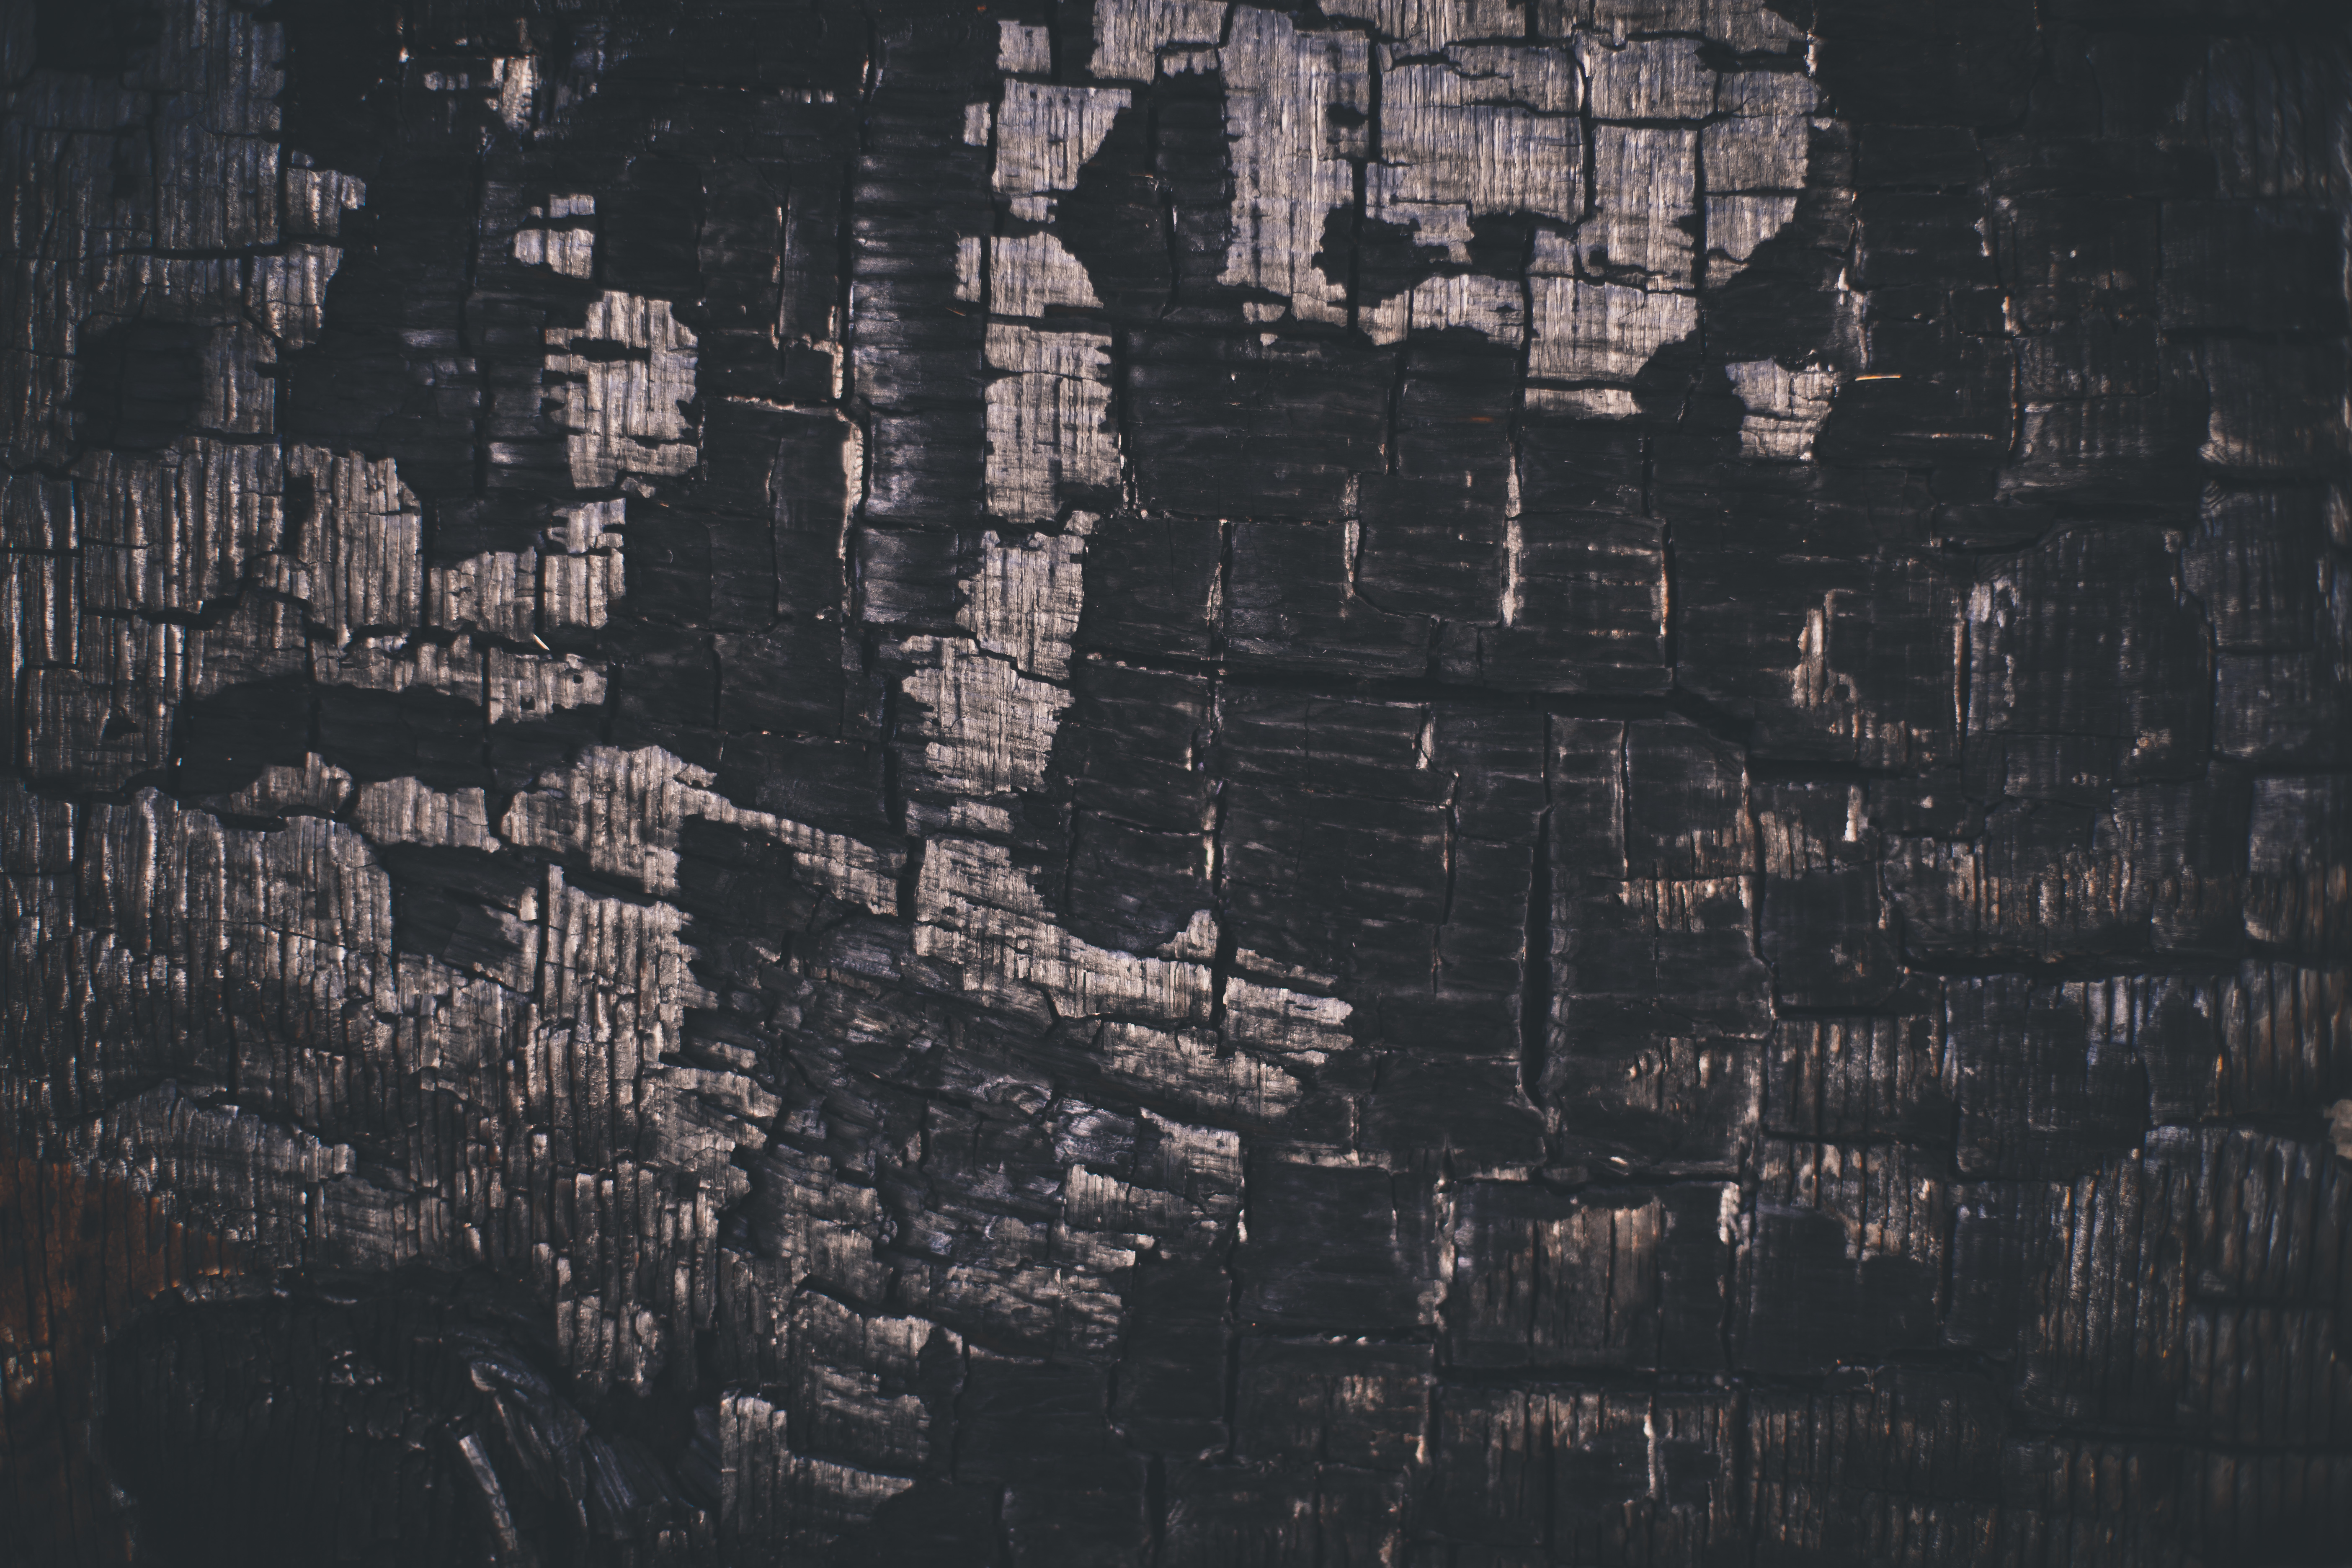 Charcoaled Wood Background, Black, Burn, Burned, Charcoal, HQ Photo